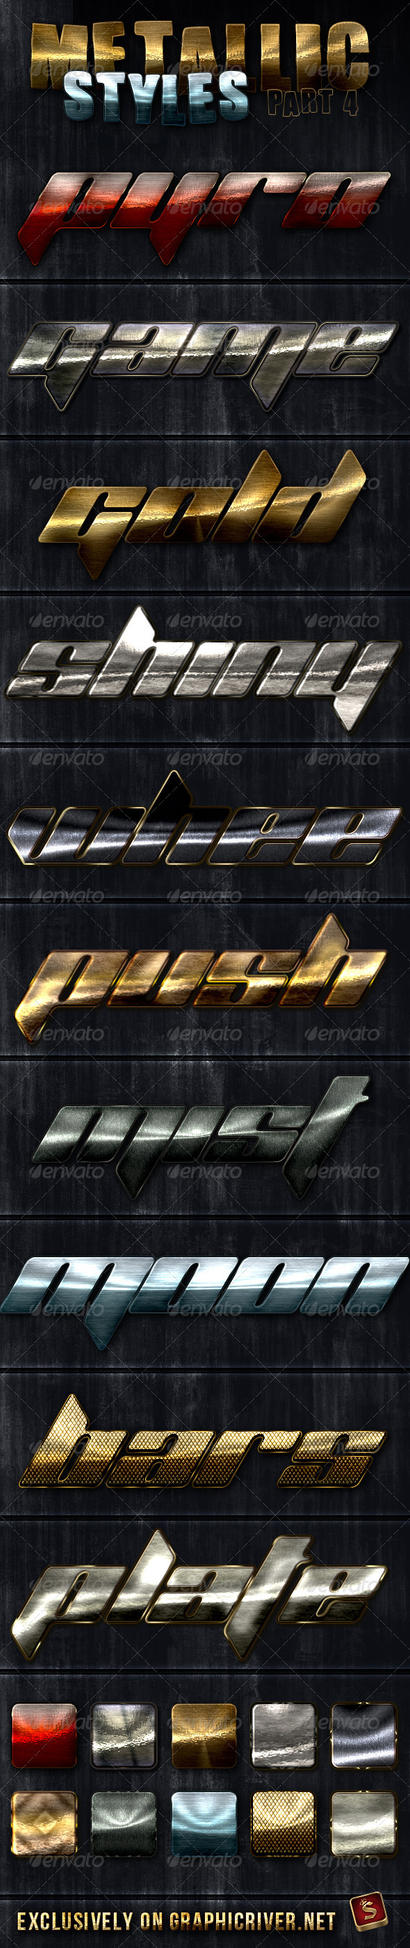 Metallic Photoshop Styles - Part 4 by survivorcz